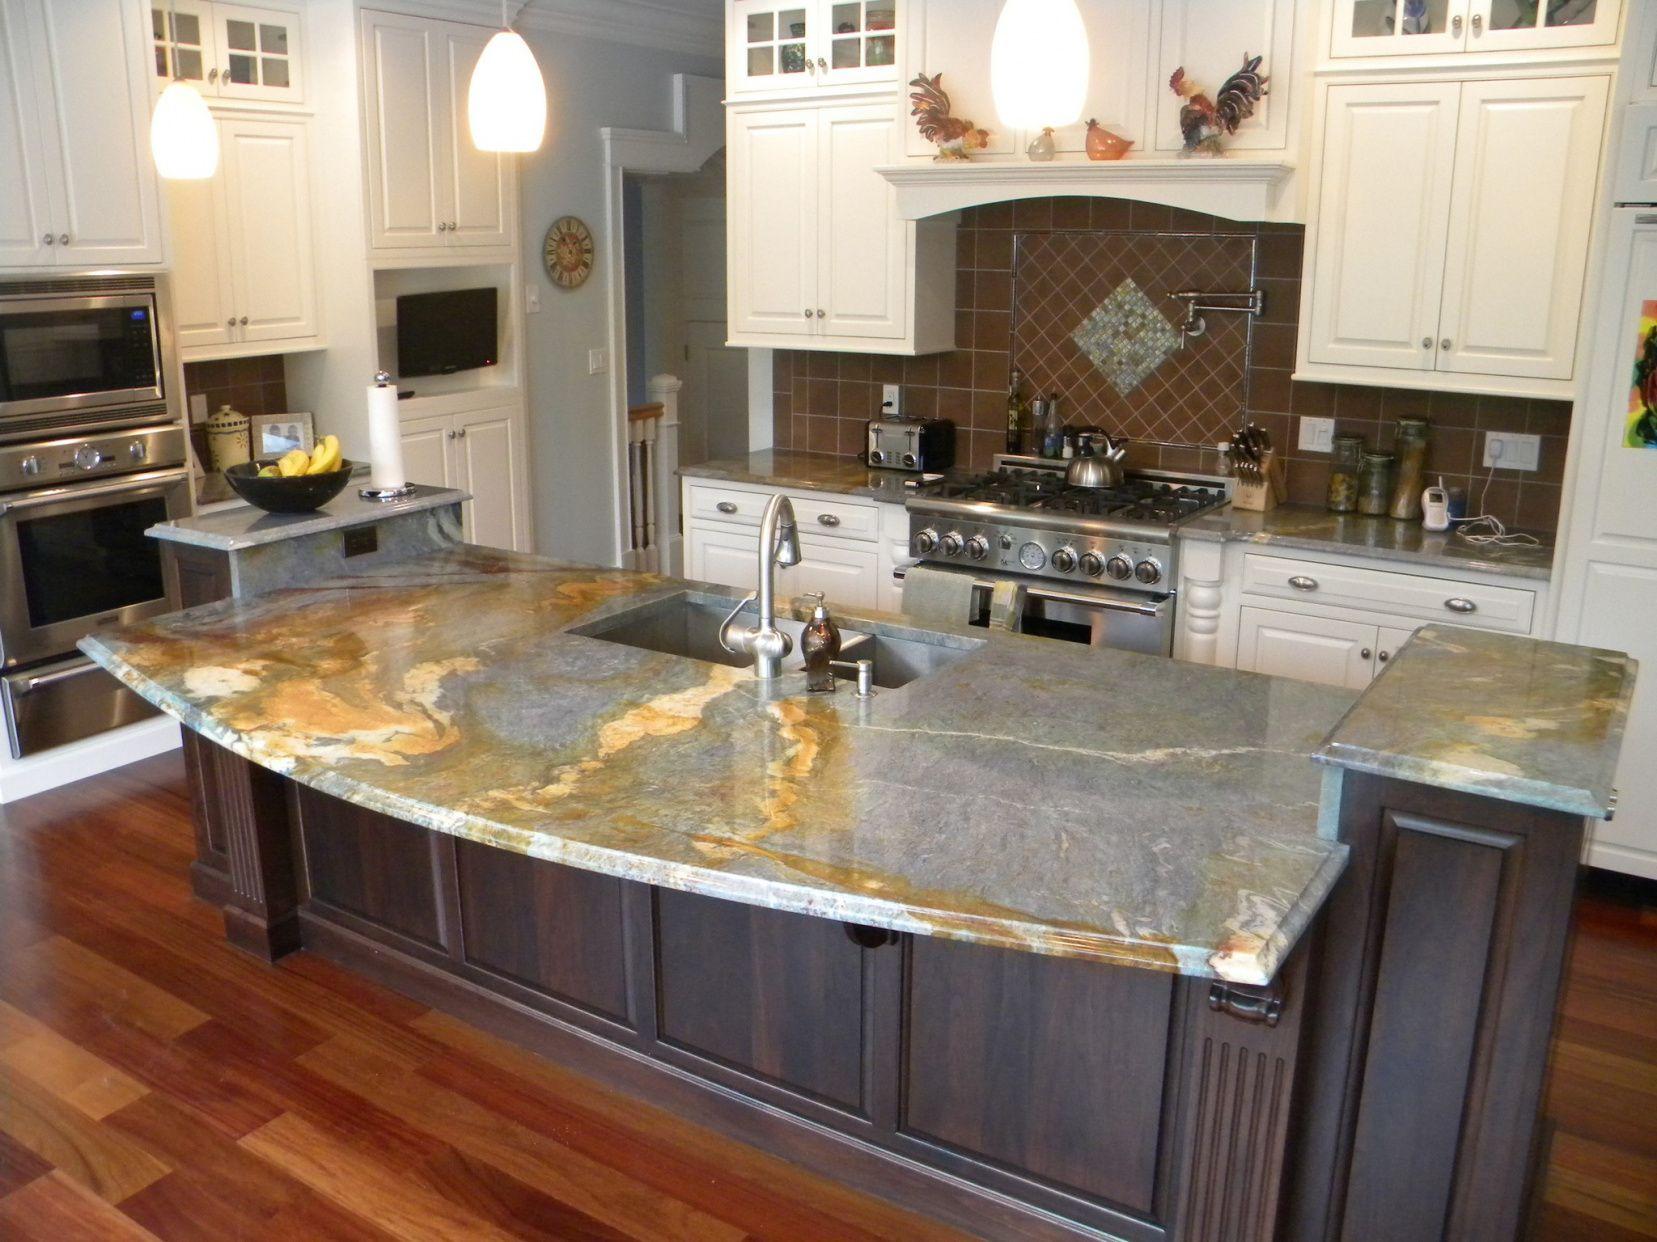 20 Granite Countertops Chicago Area Kitchen Cabinets Ideas Check More At Http